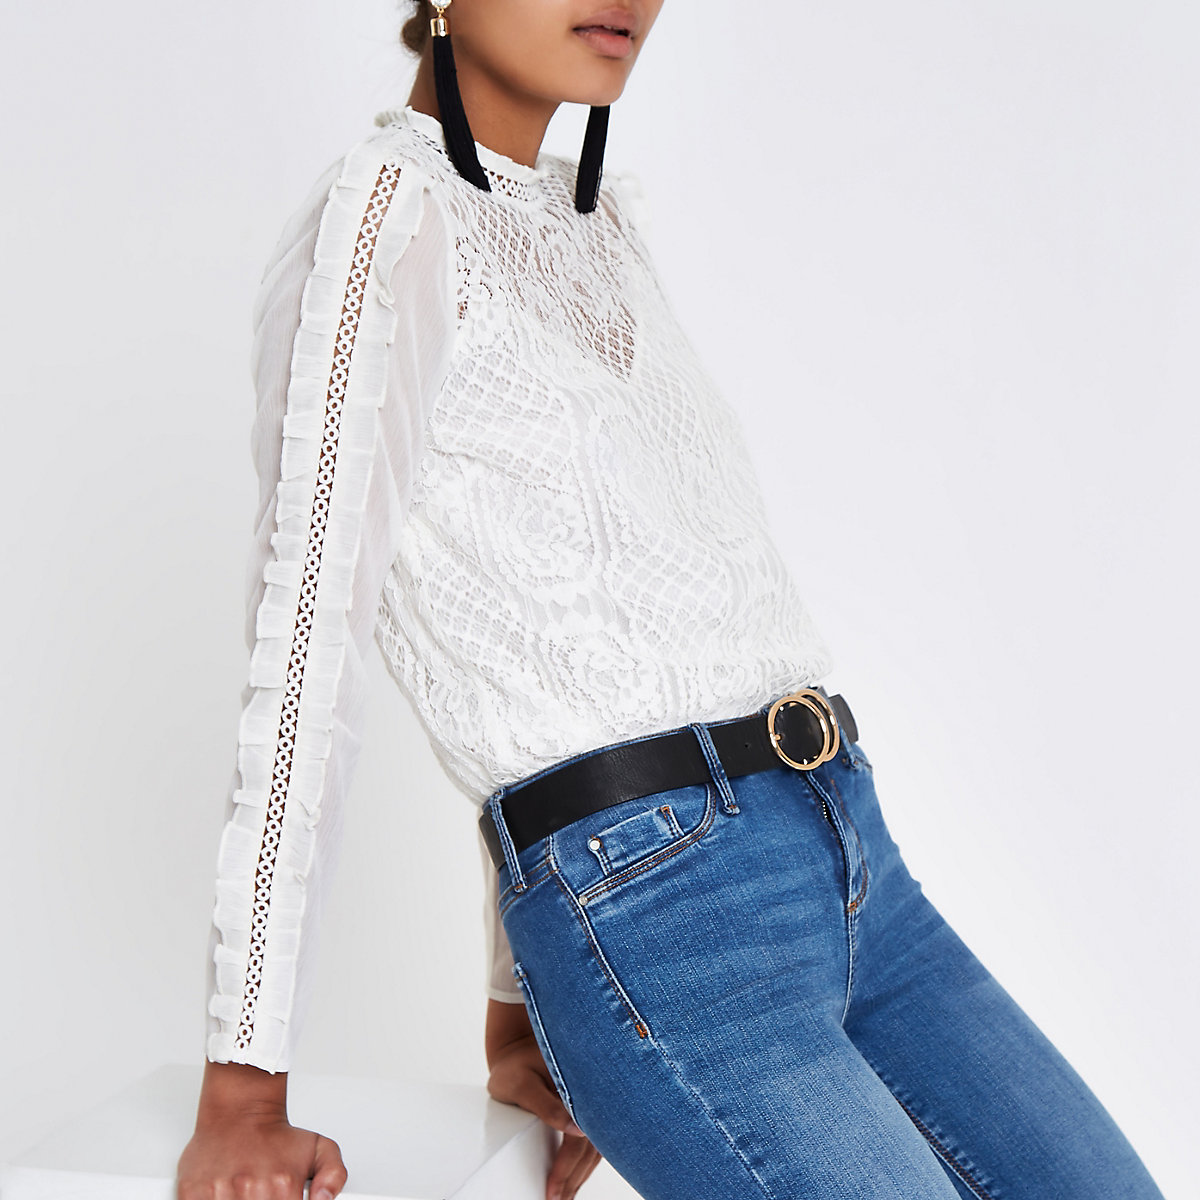 White lace ruffle long sleeve top